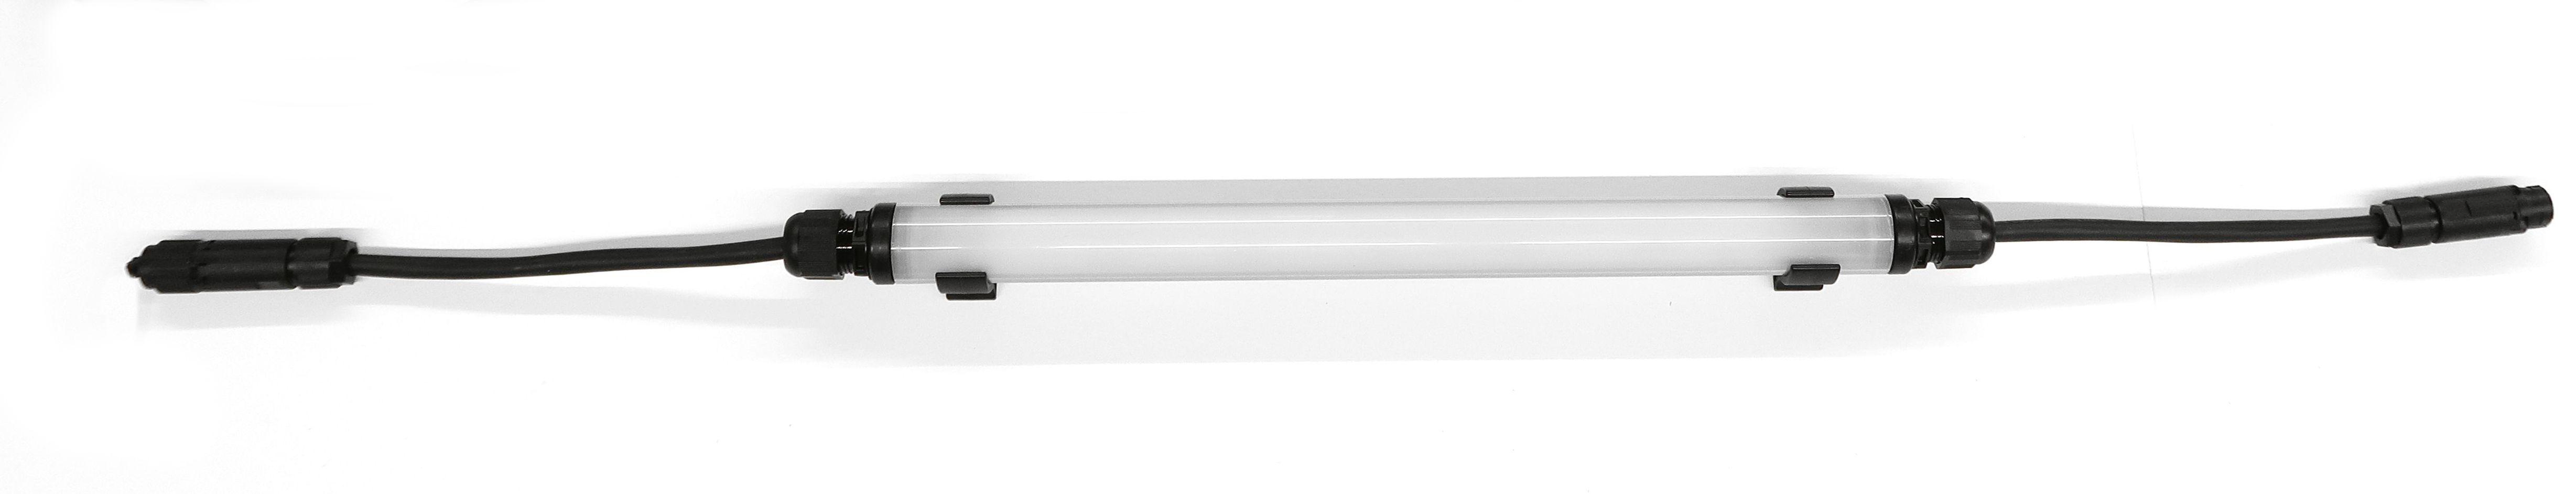 Serie 23 LED: 17 Watt/ 220-240 Volt/ 1050 mm   (DU m. Kabel u. Steckv